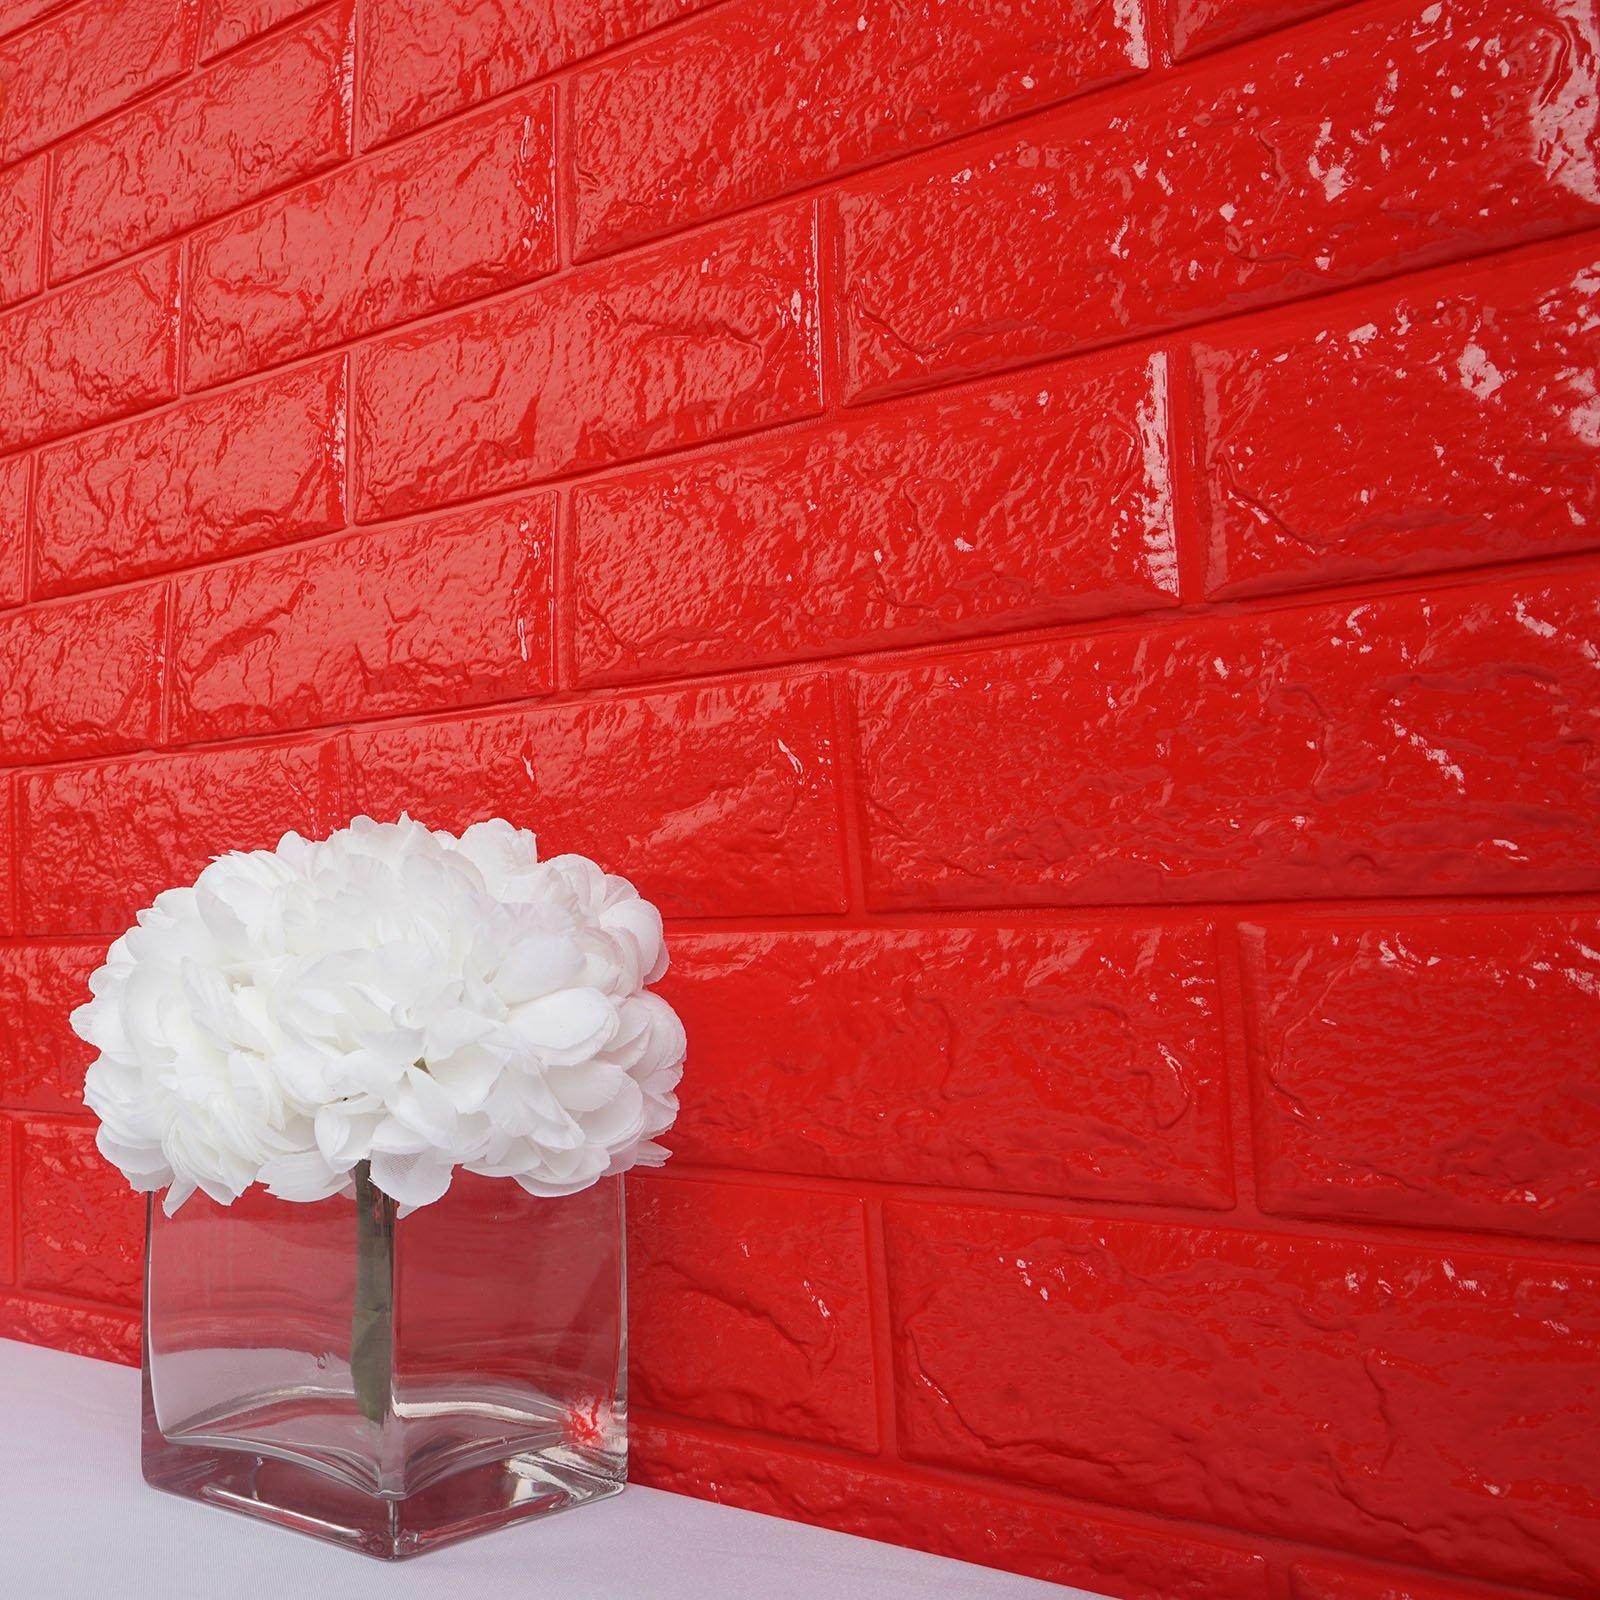 Wallpaper Dinding Foam 3D Batu Bata Putih Hitam Hijau Merah Ukuran 70 X 77 Cm